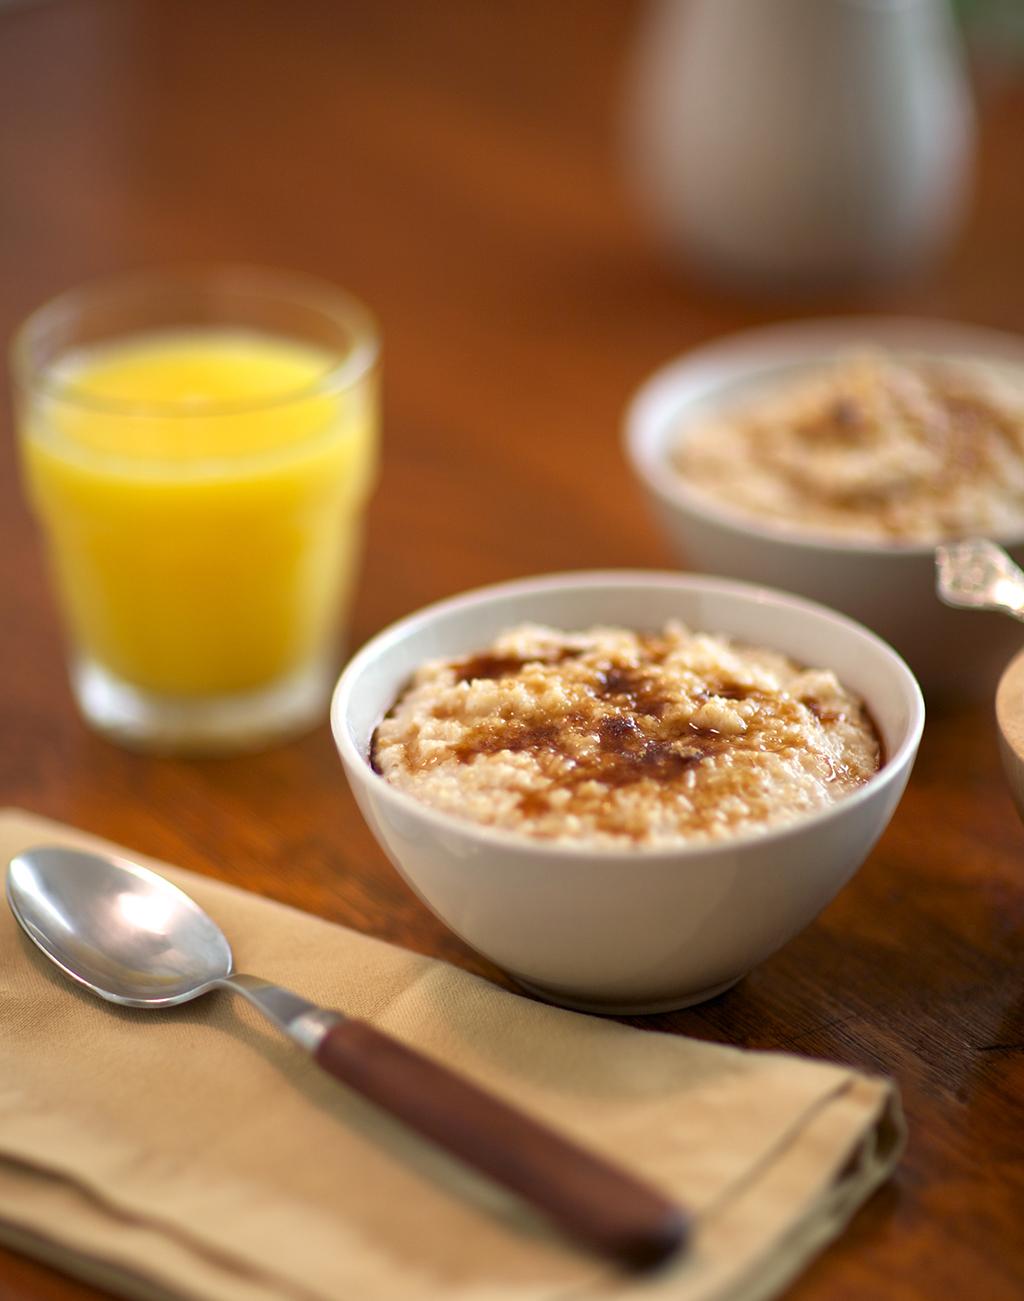 oatmeal, orange juice, food synergy younger